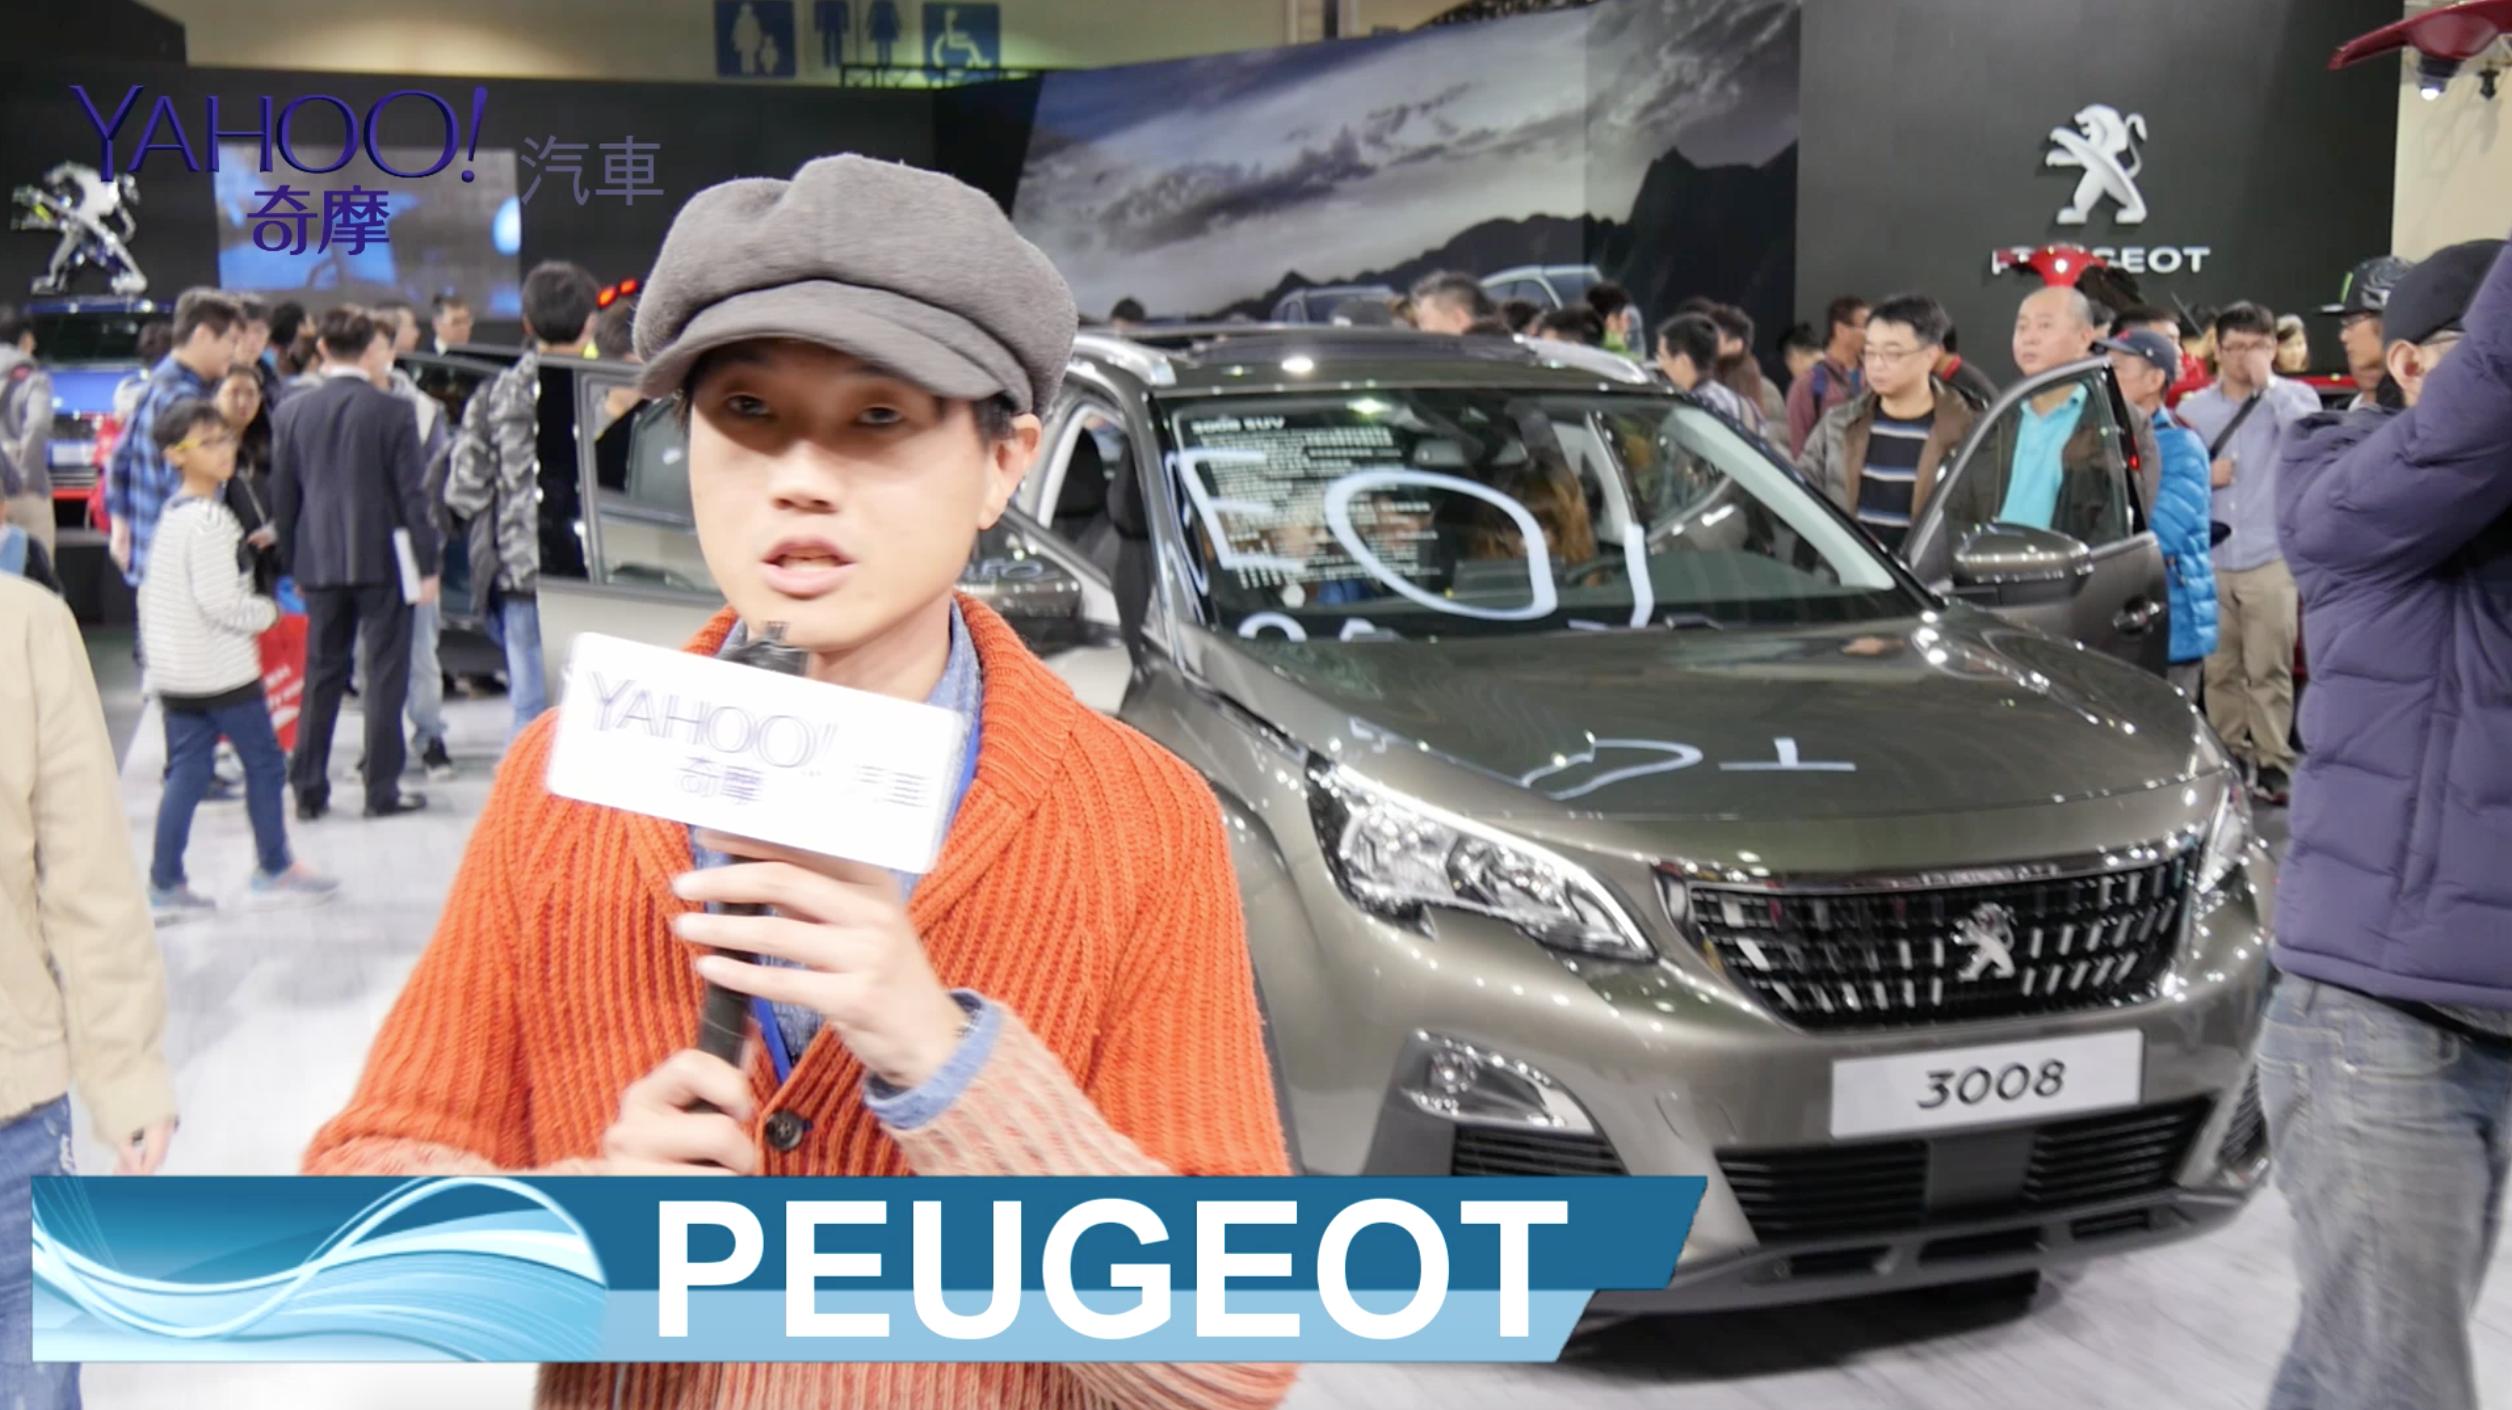 【台北車展速報】Luxgen、Peugeot、Citroen、DS、Nissan、Suzuki、Toyota以及Vespa展場重點導覽!